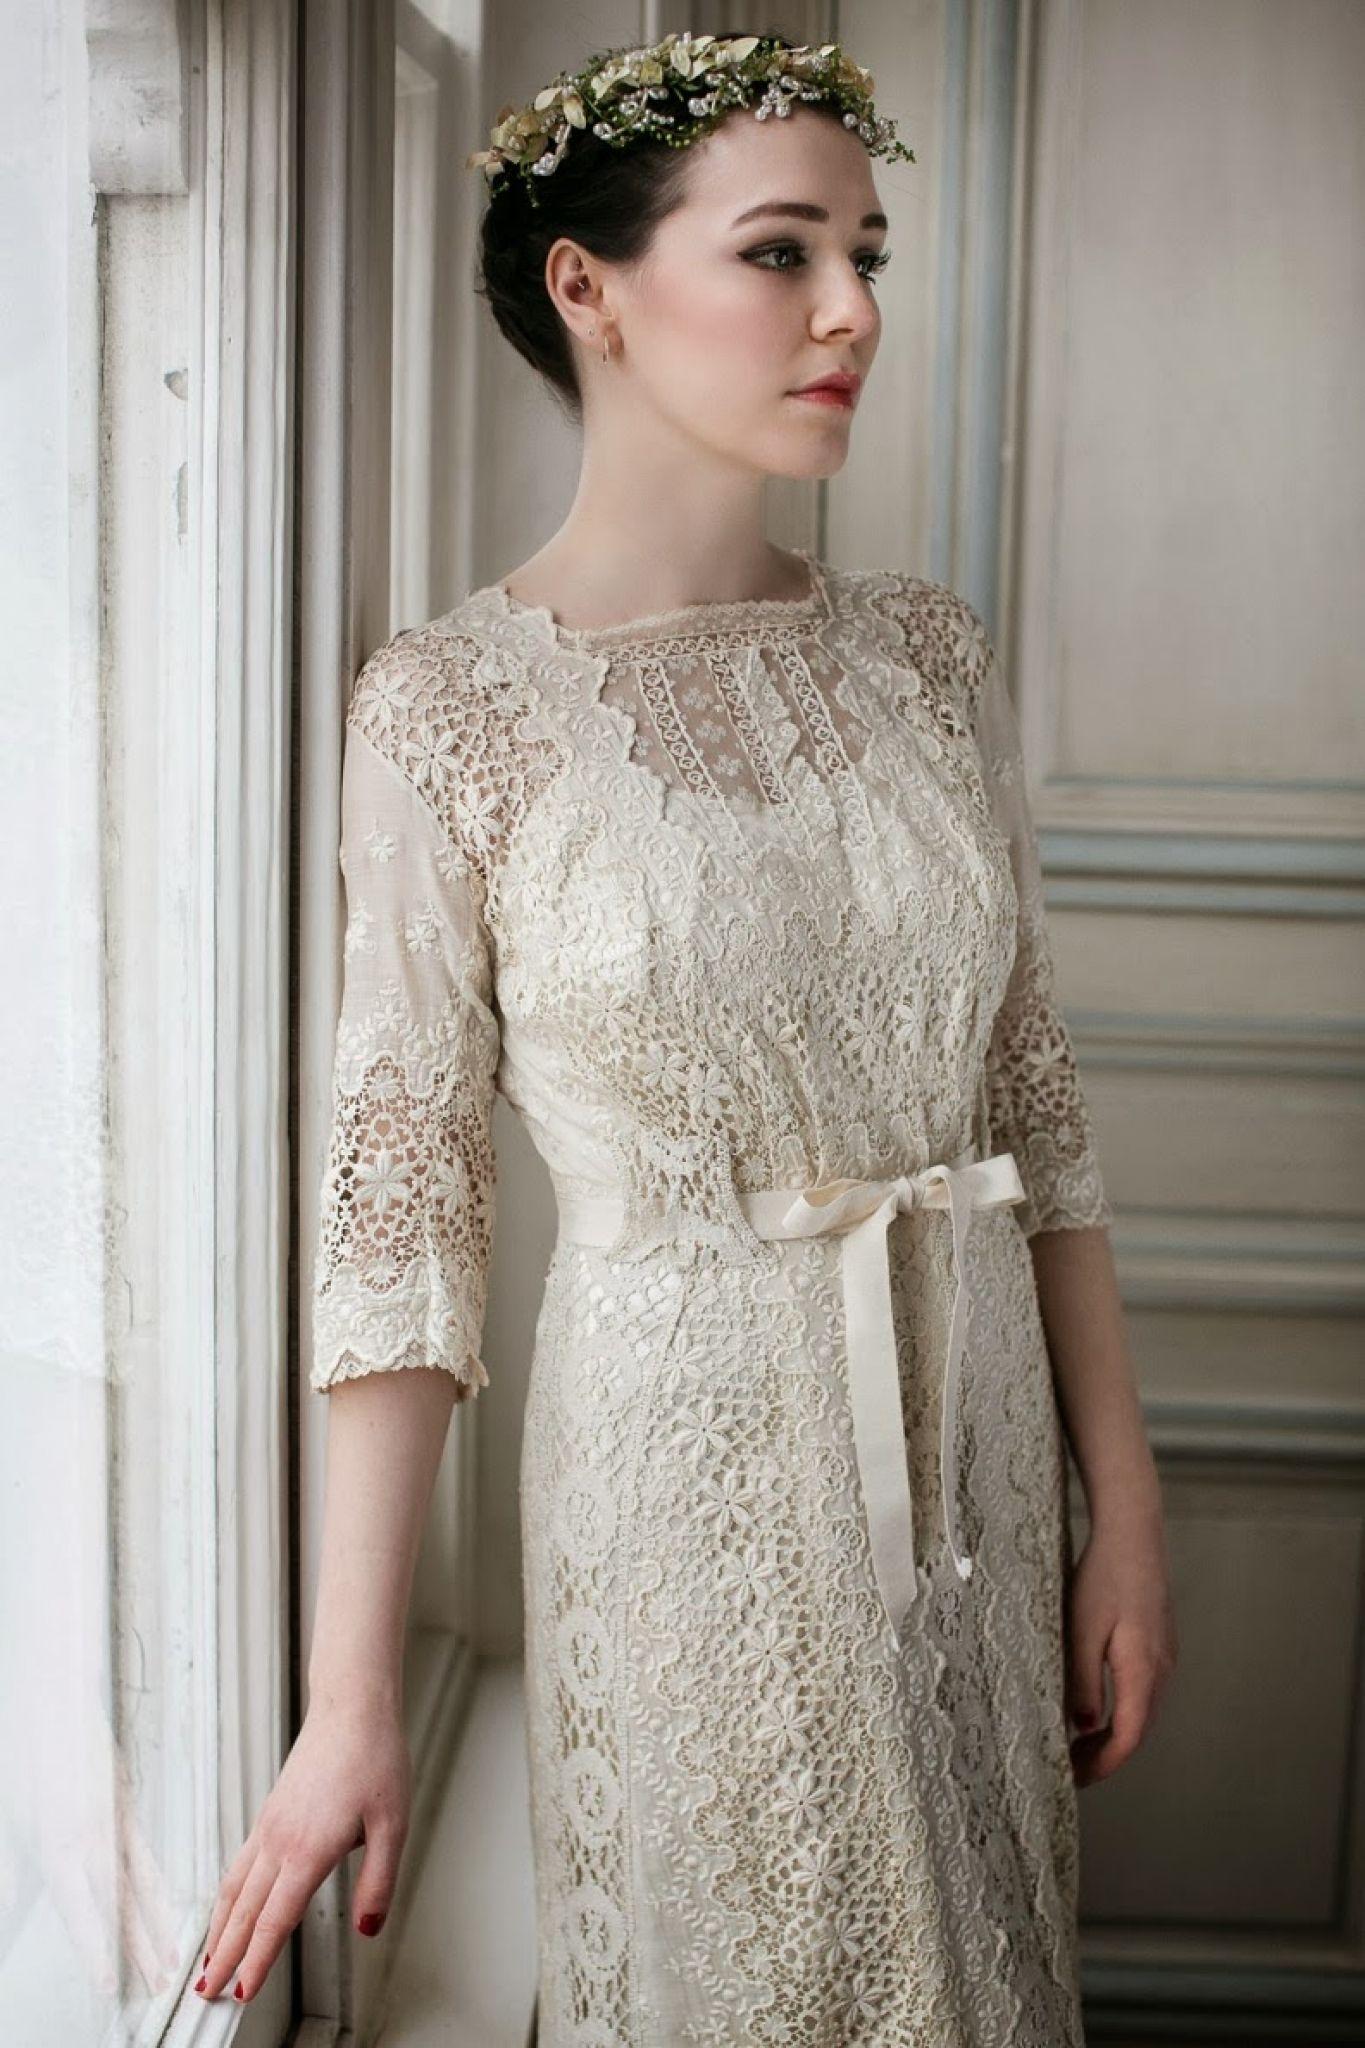 Old fashioned lace wedding dress